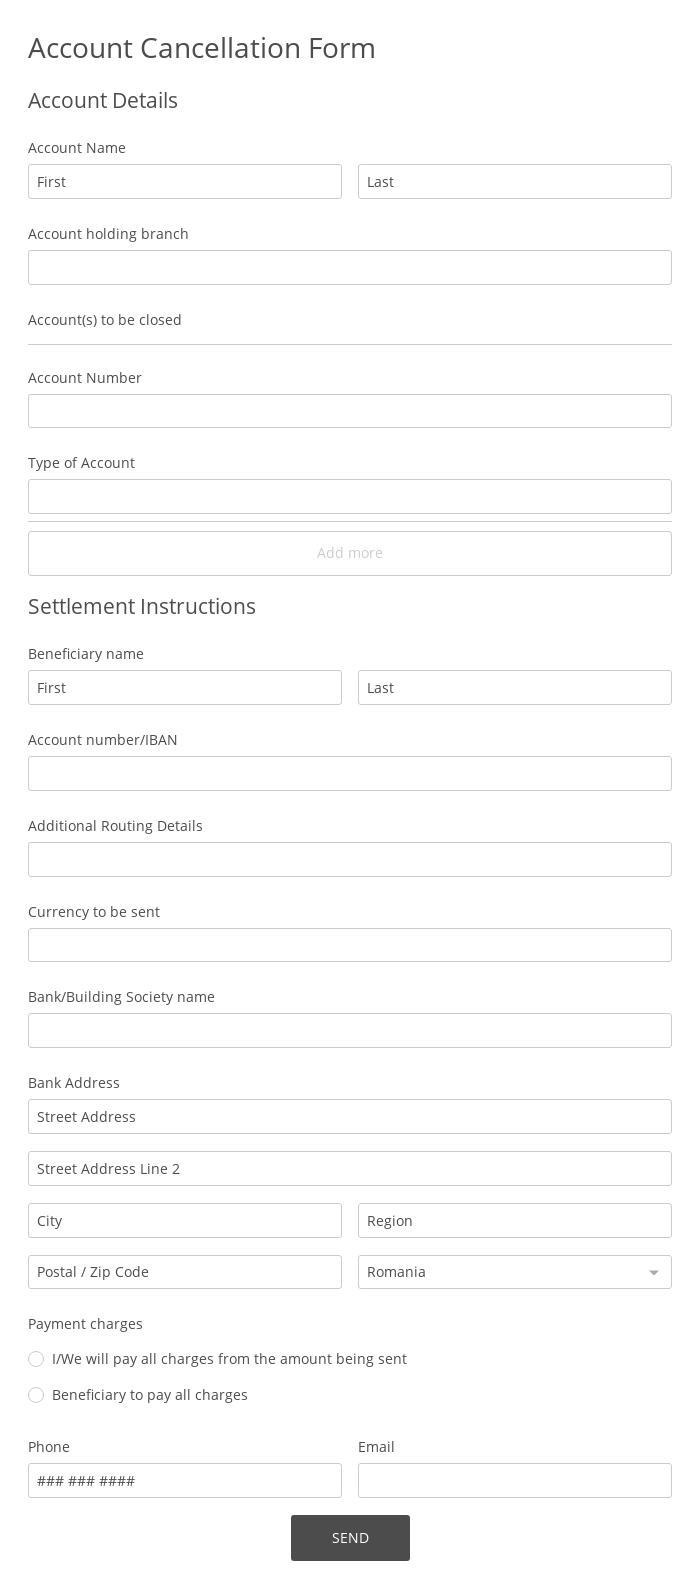 Account Cancellation Form